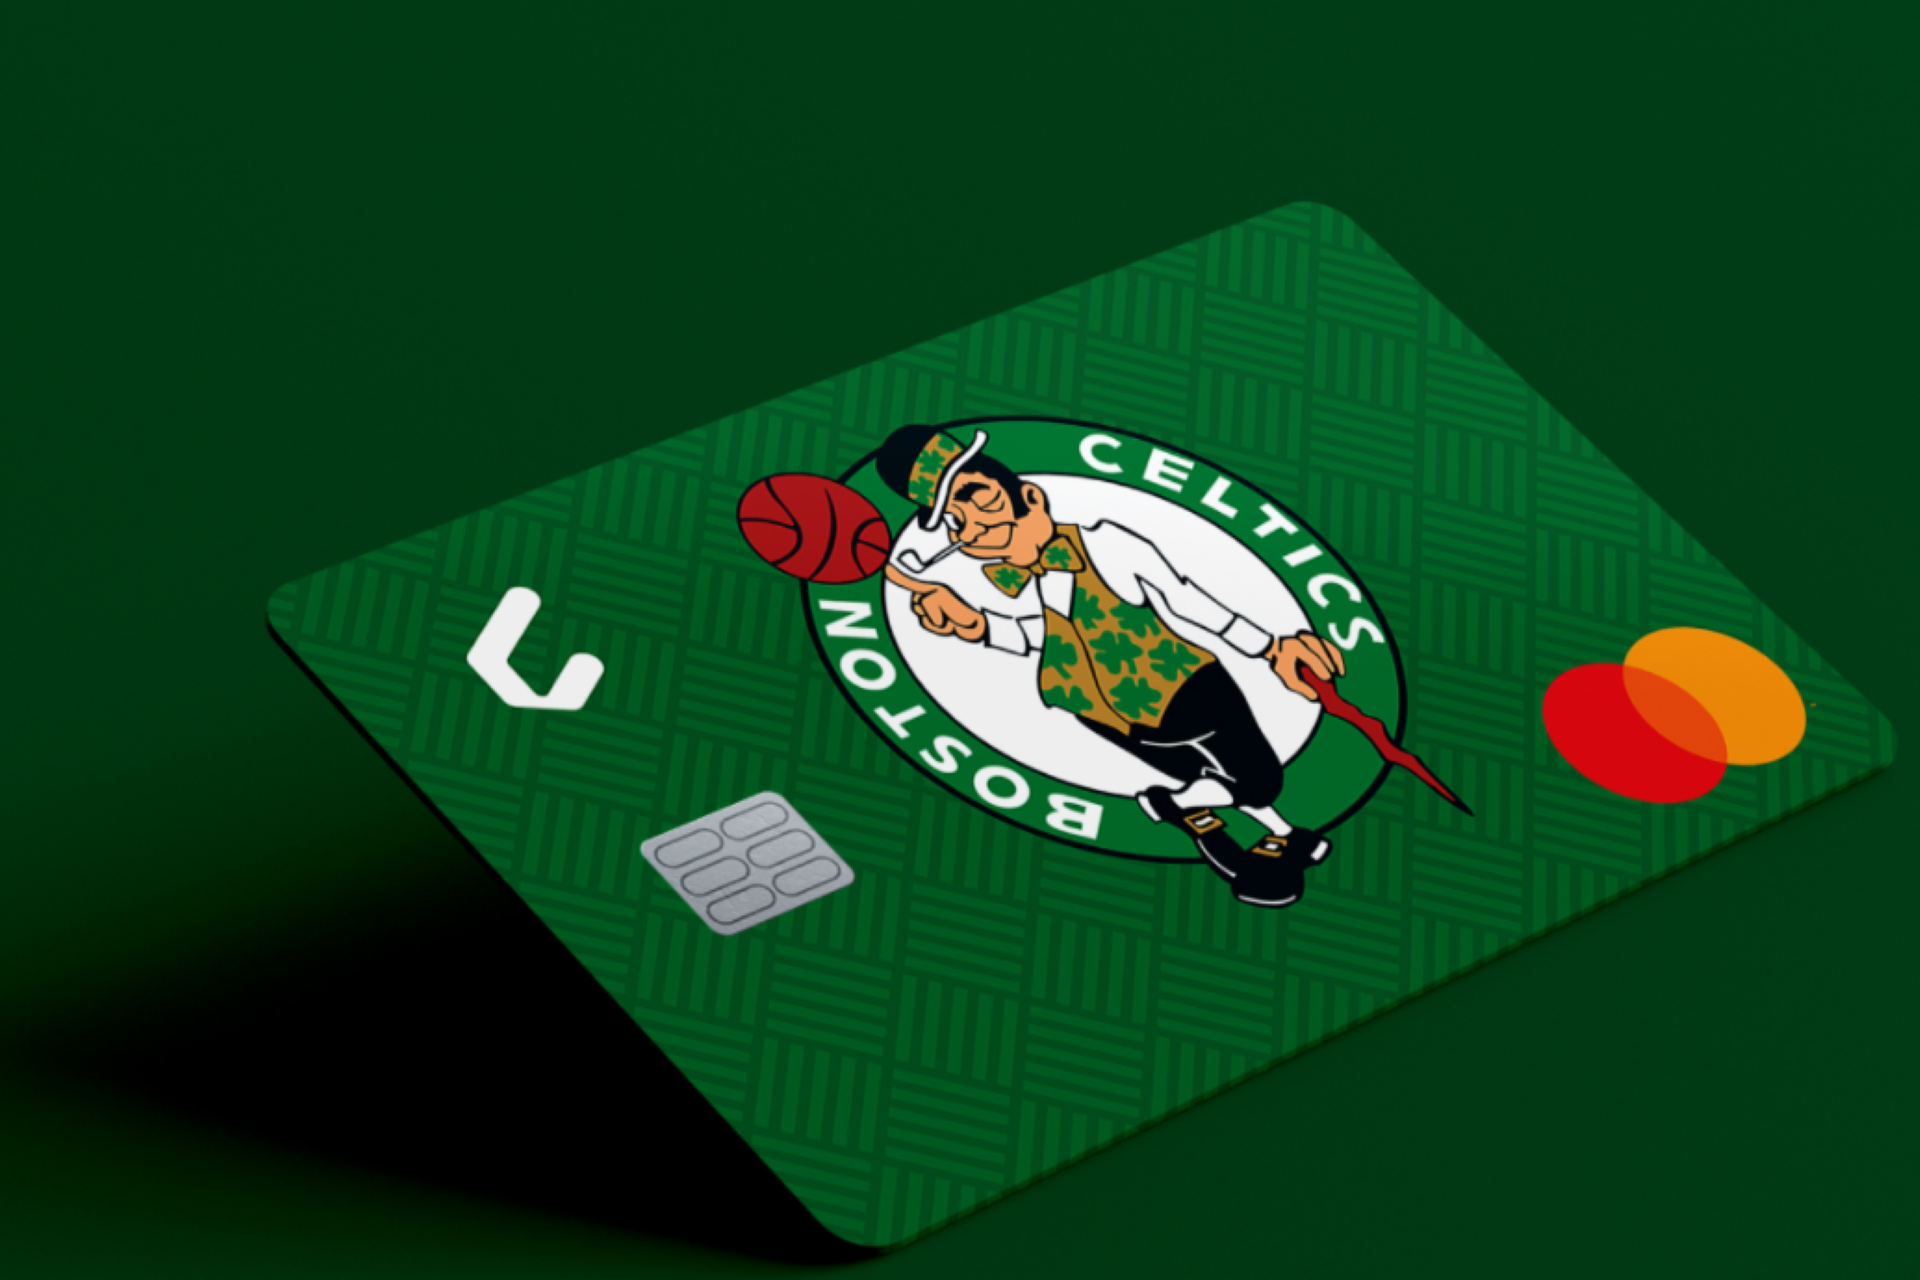 cardless-launches-new-boston-celtics-credit-card mastercard